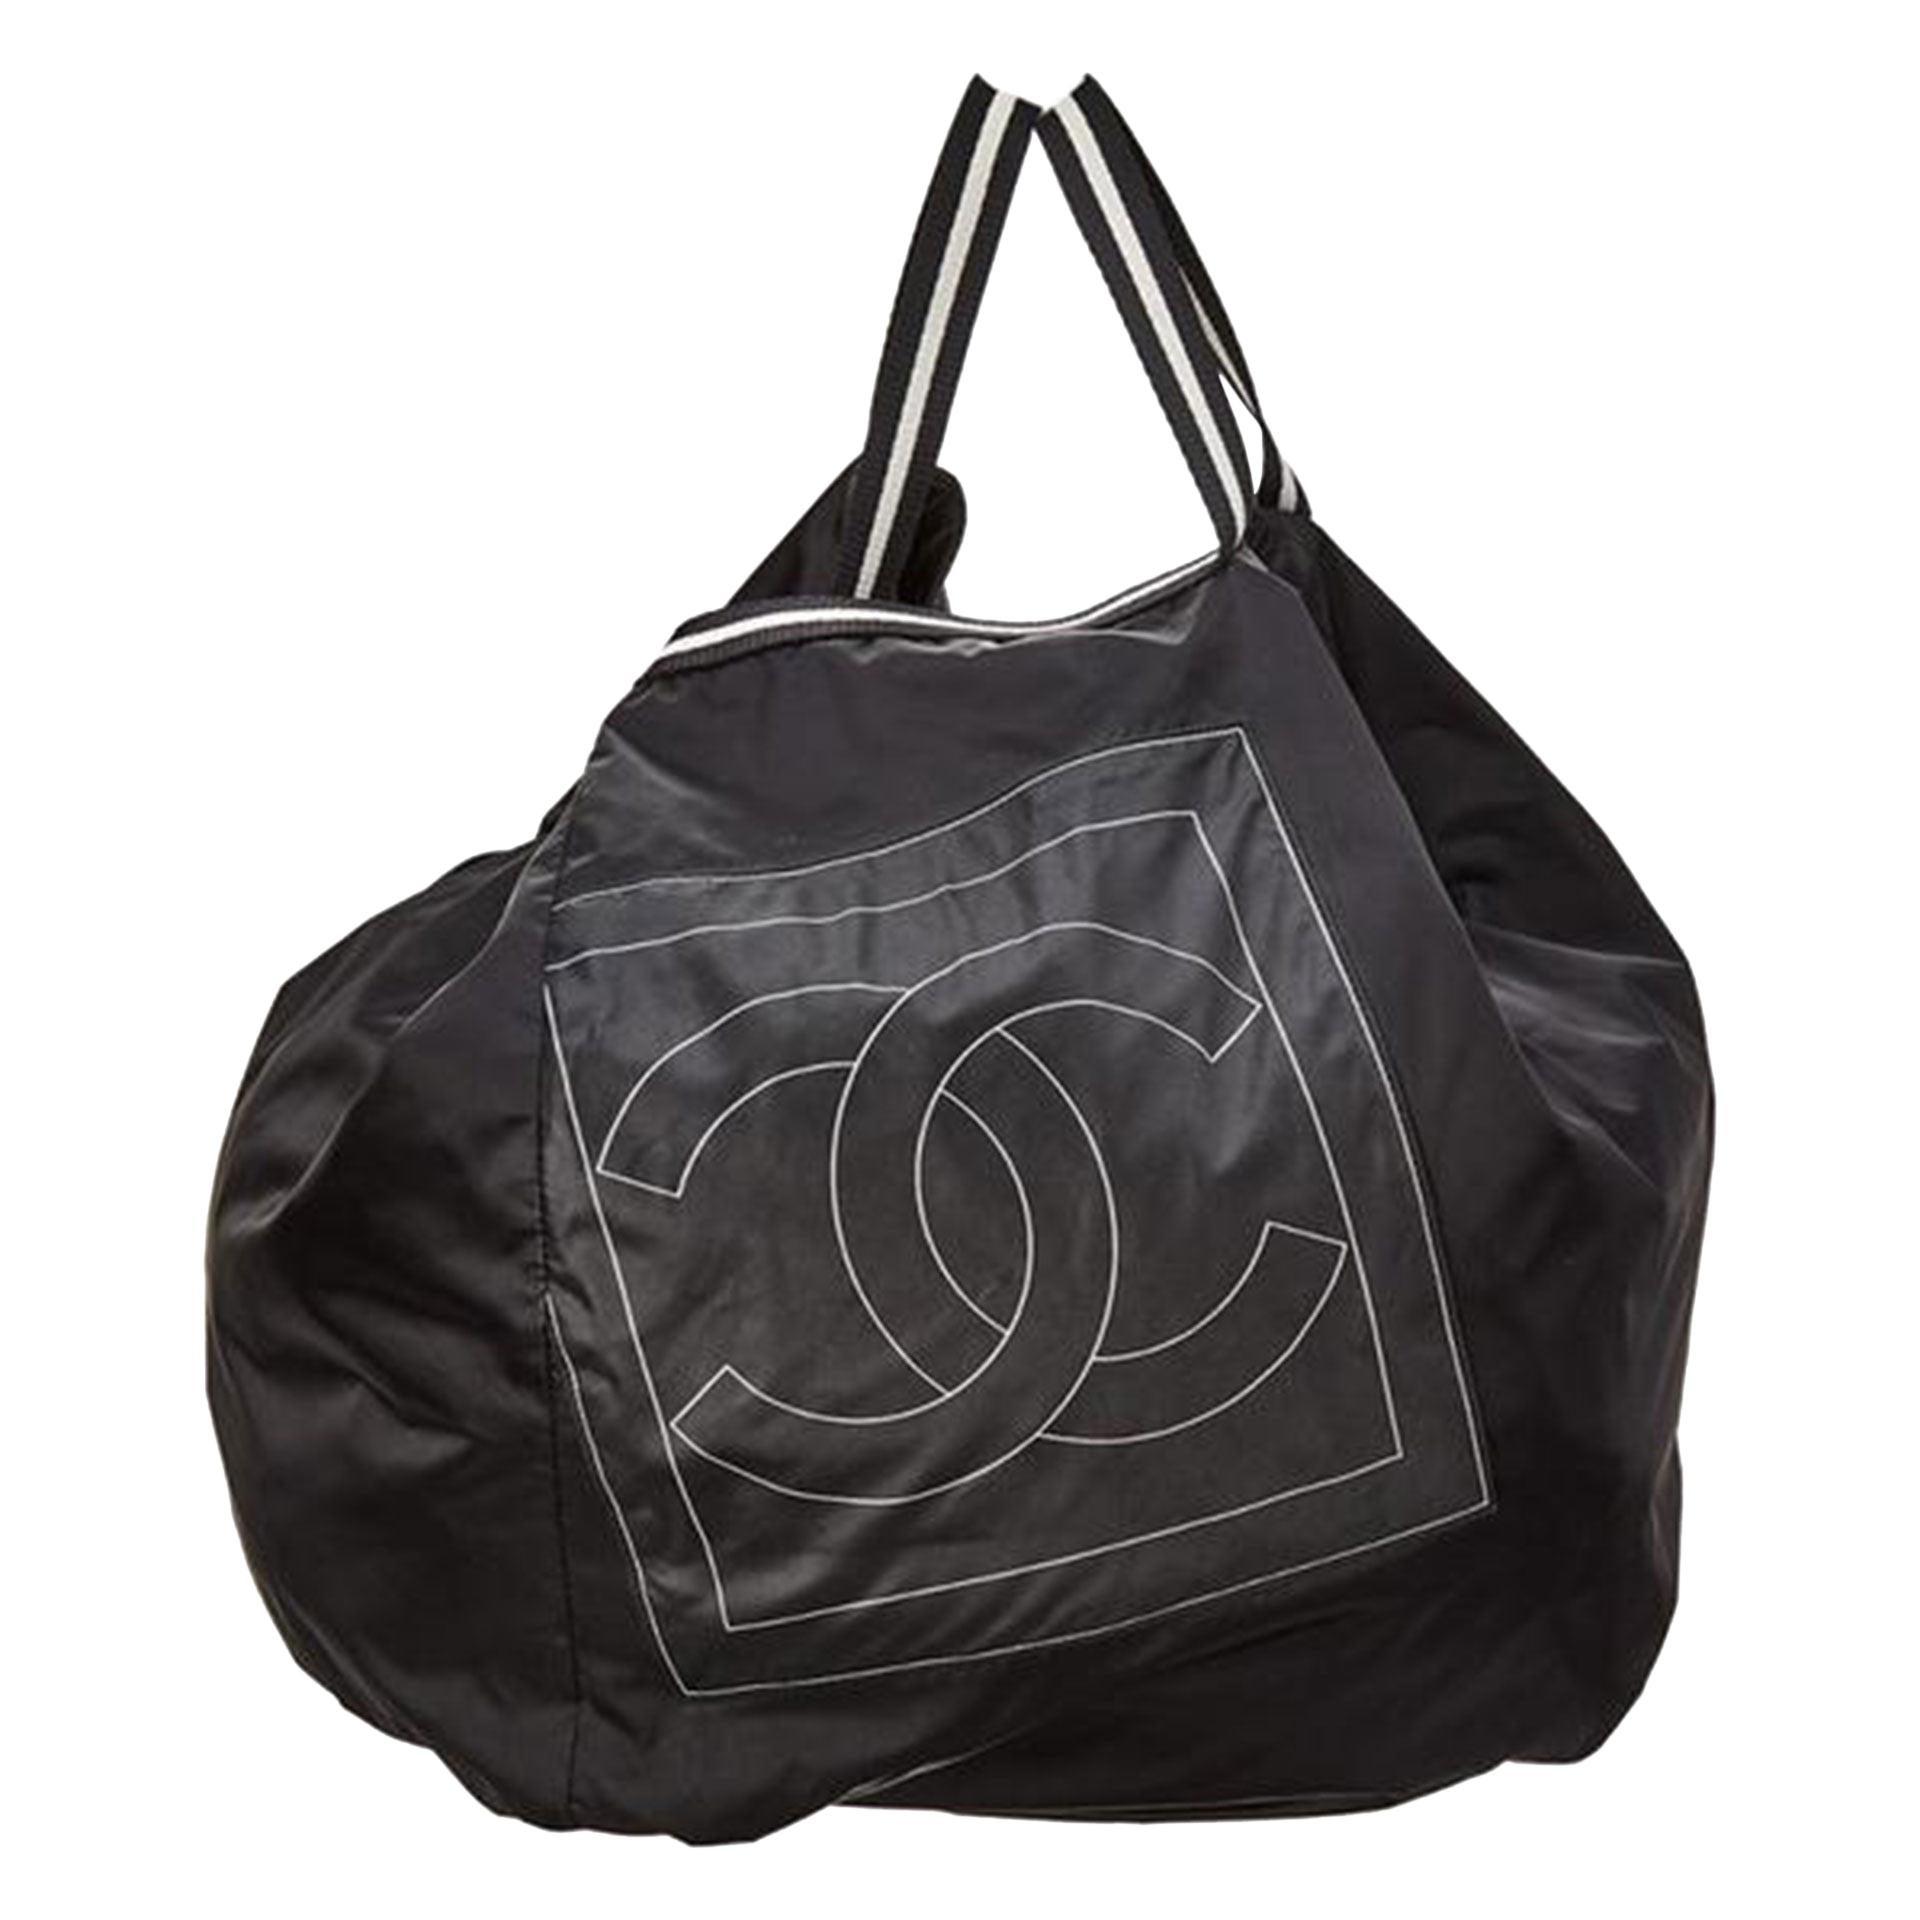 Chanel Nylon CC Logo Sporty Gym Bag